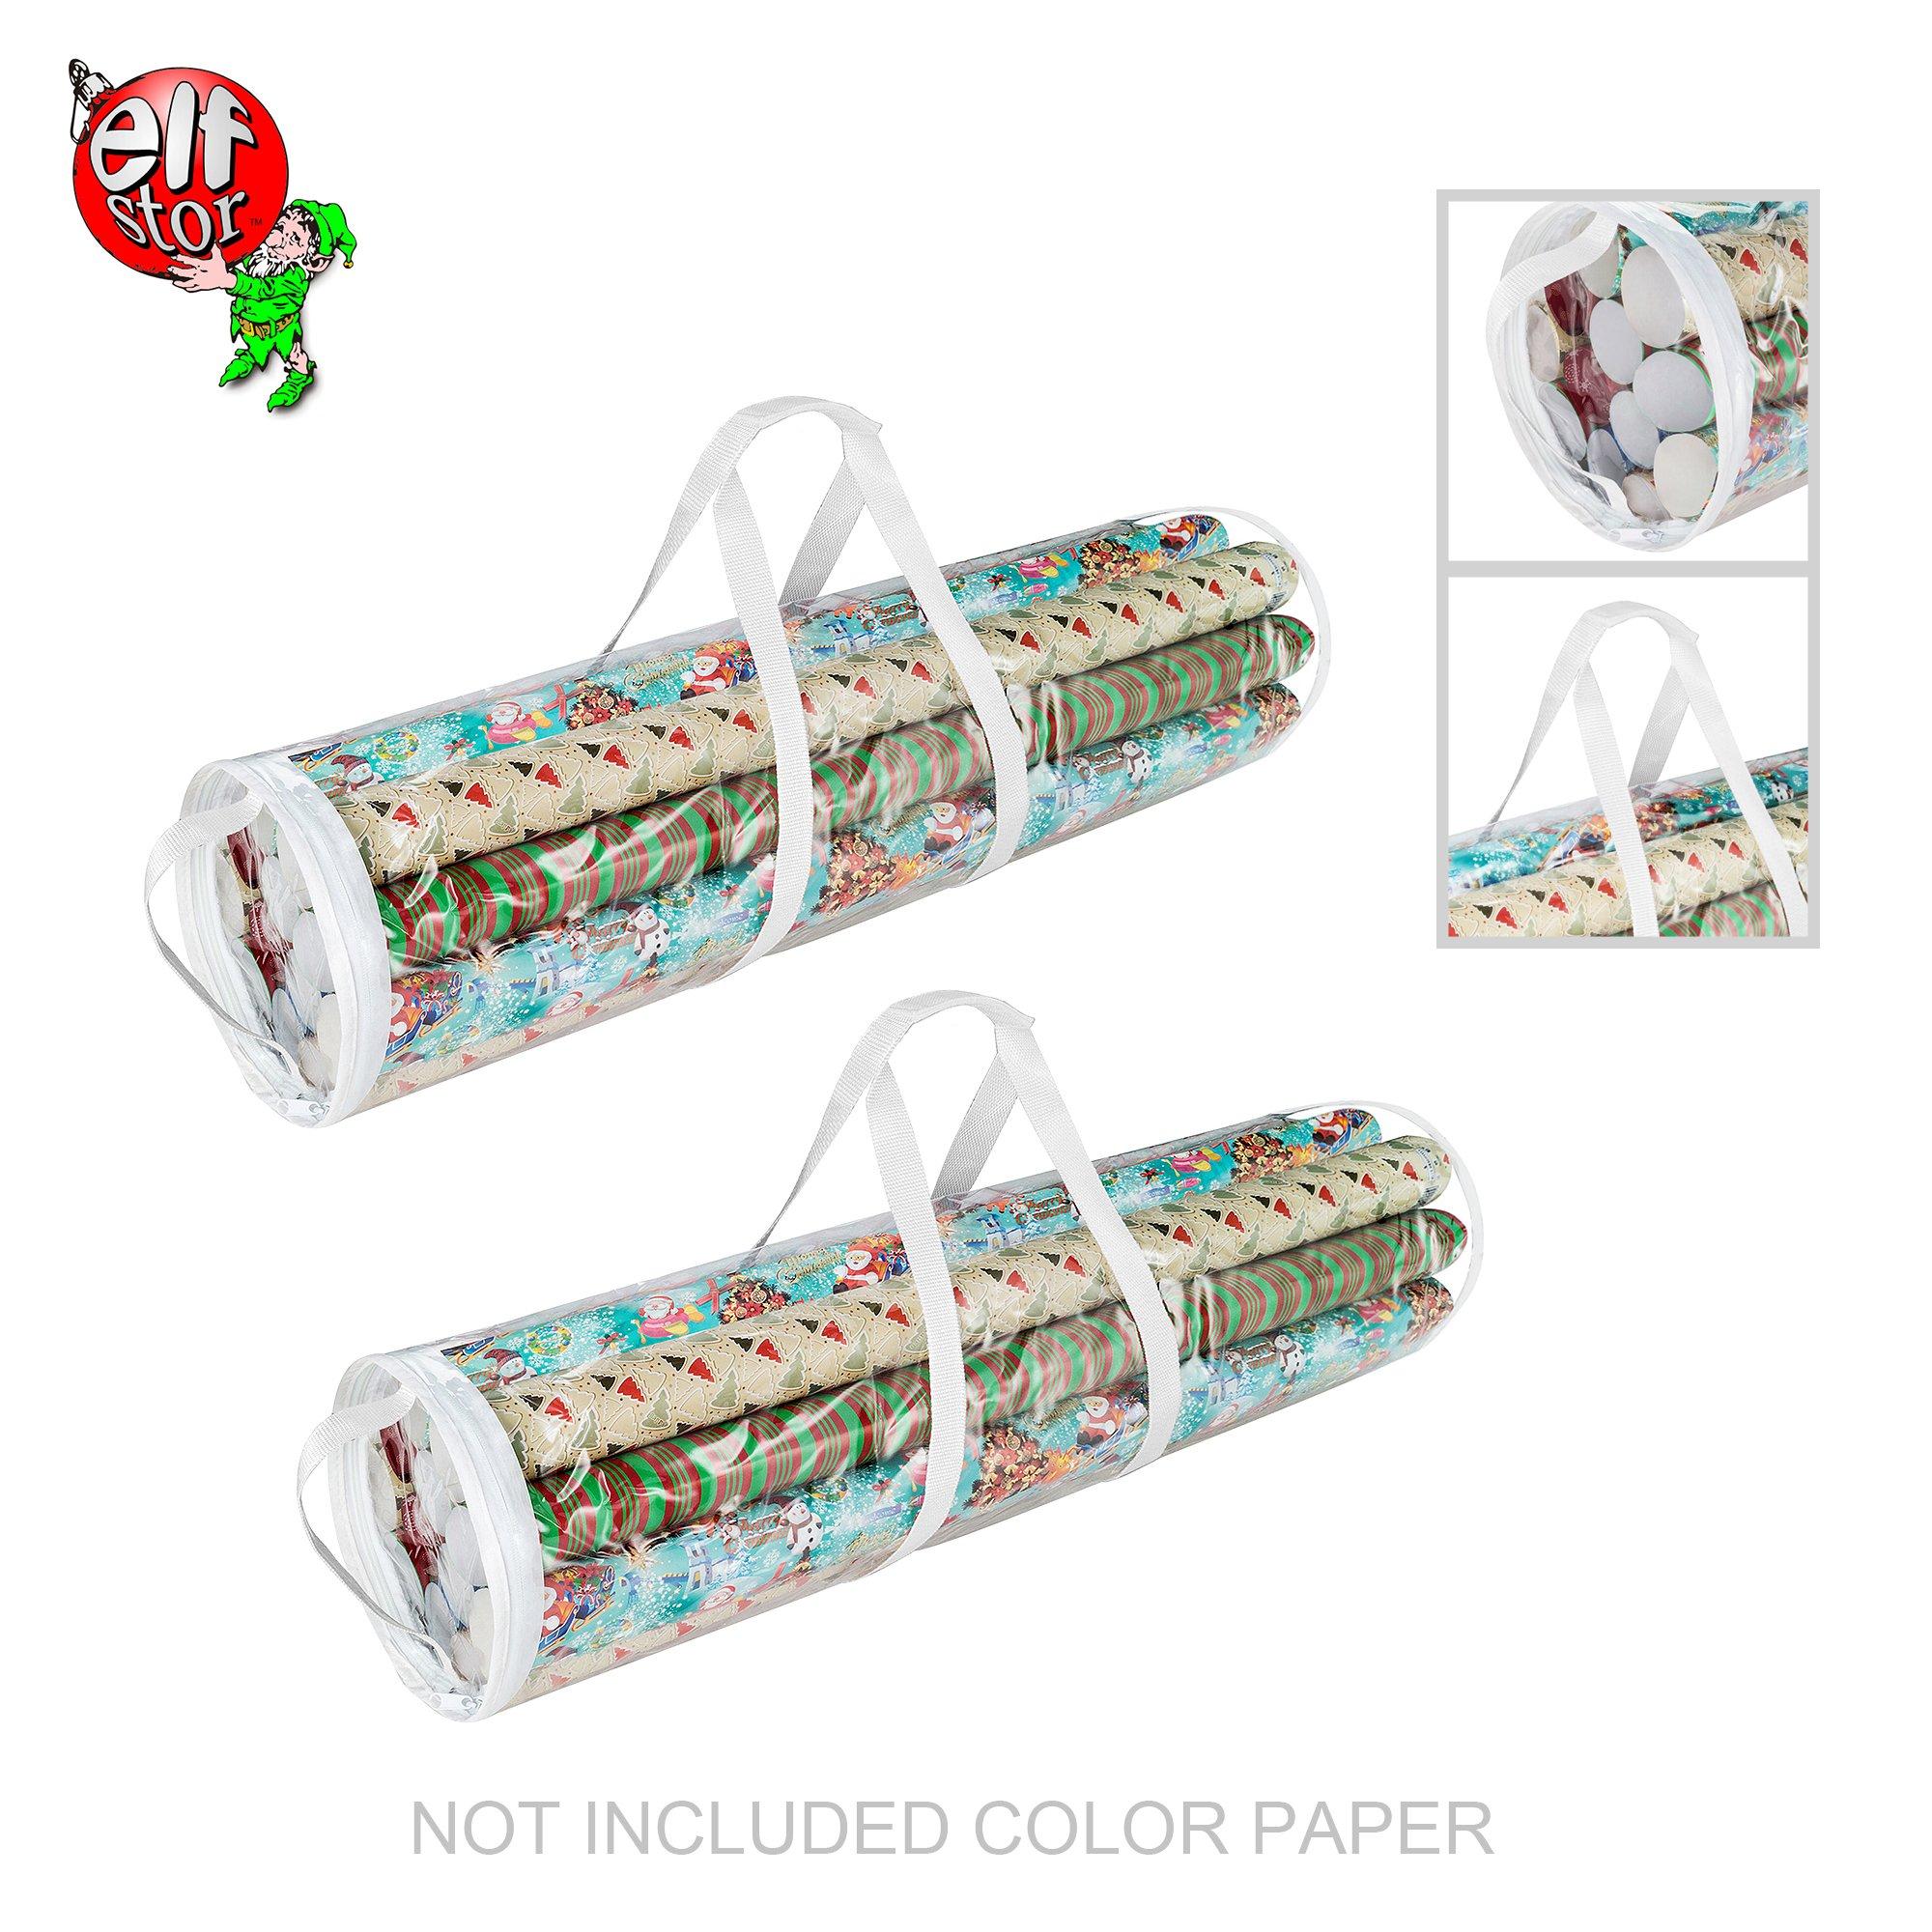 Elf Stor 83-DT5053 1075 Paper Gift Wrap Storage Bag for 31 Inch Rolls   2 Pack